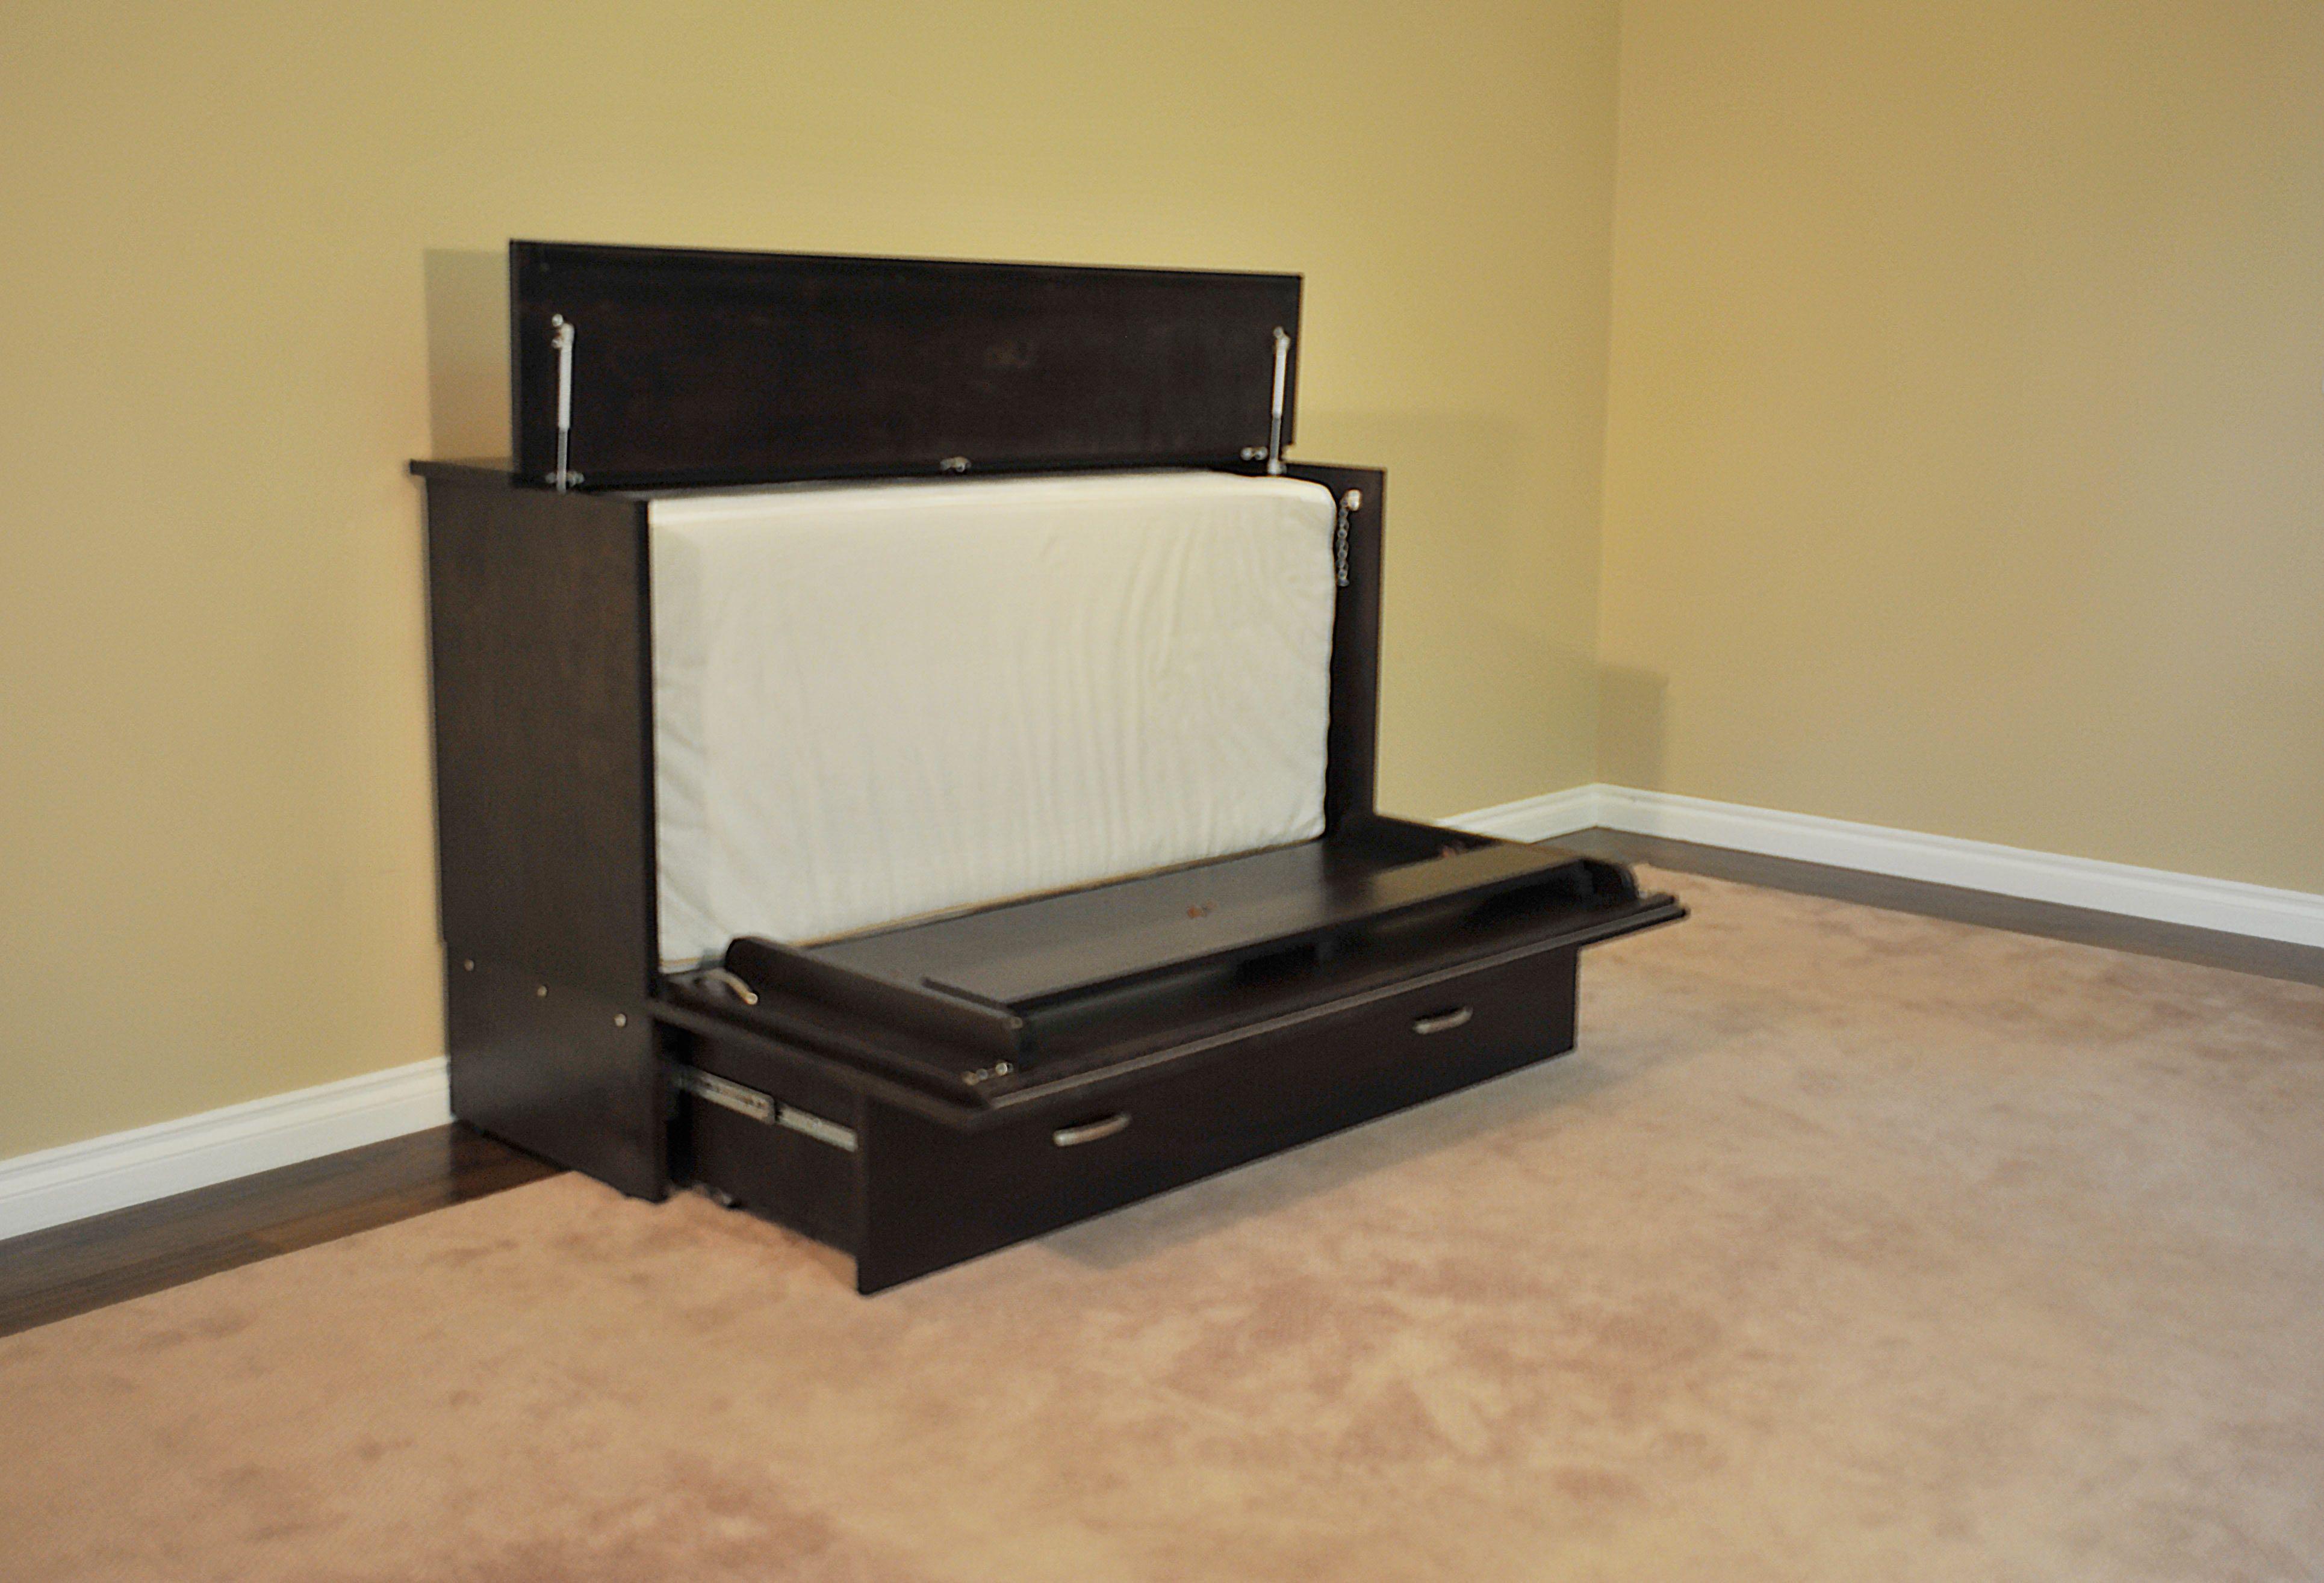 Cape Cod Deluxe Queen Bed (Murphy Bed) by